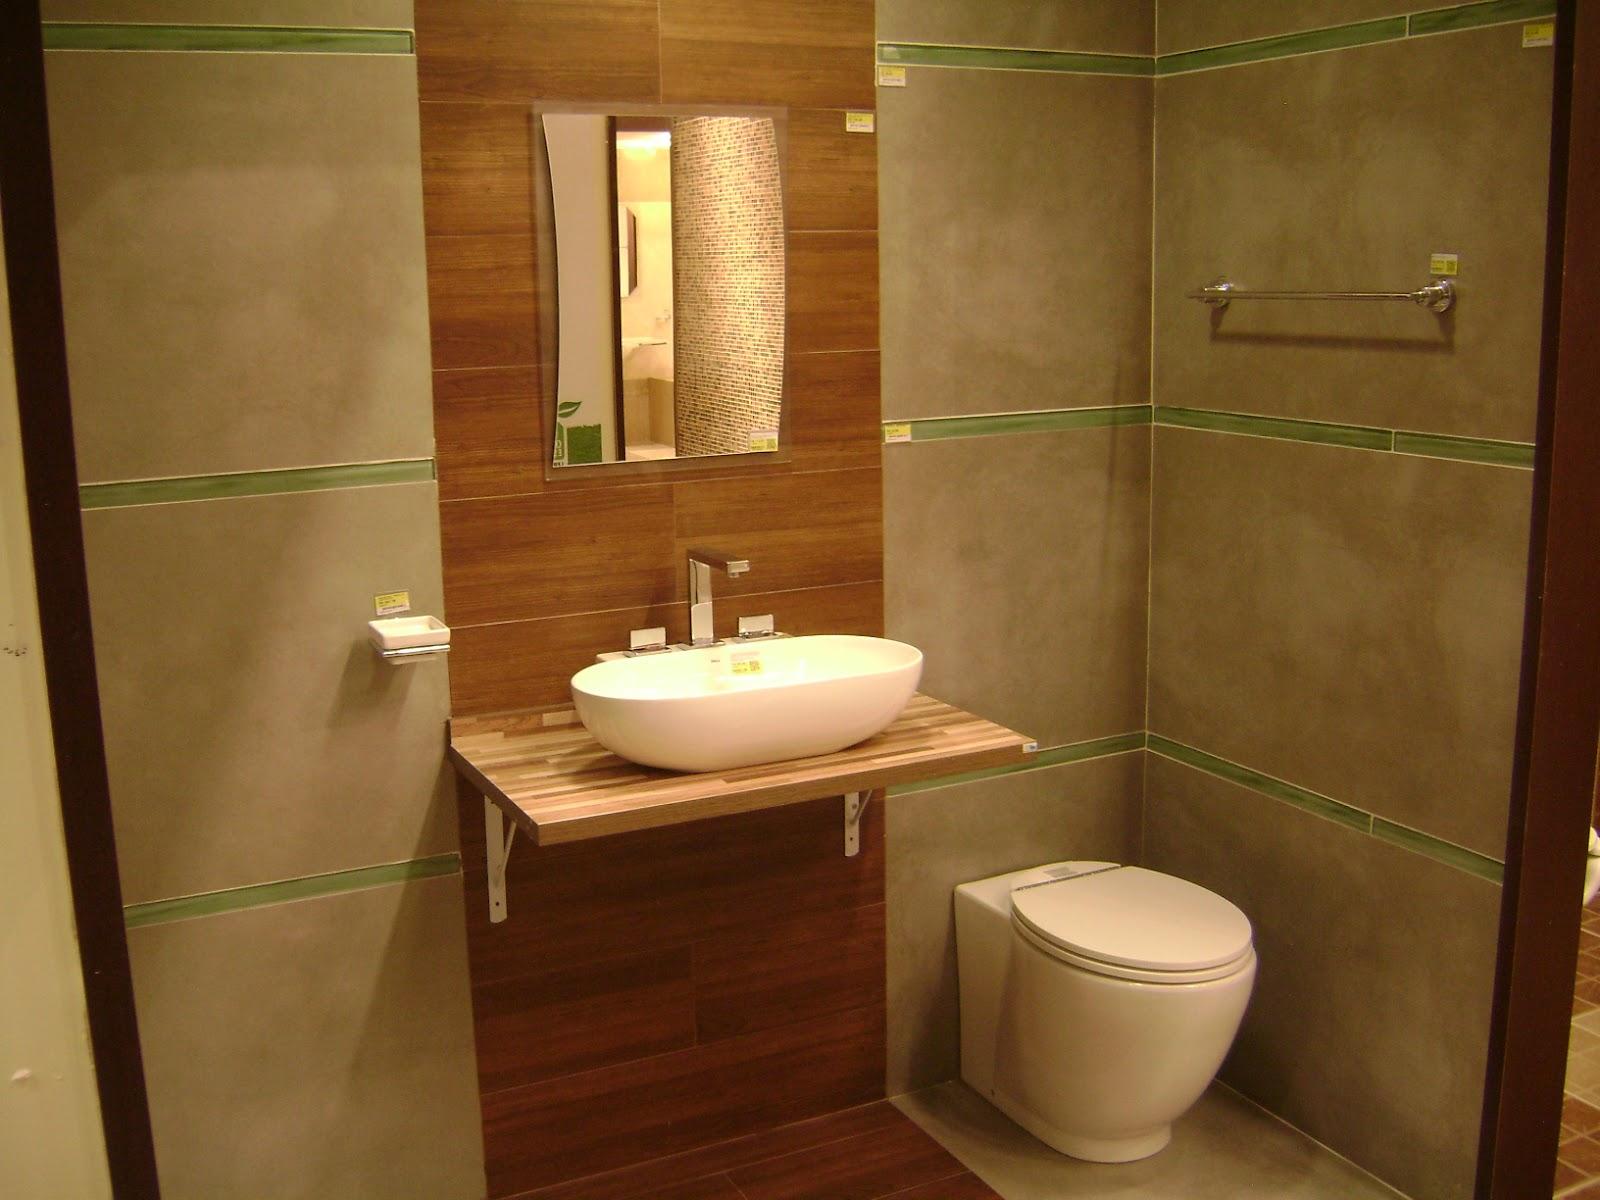 Arquitetura: Projetos Ambientes Show Room Leroy Merlin Sorocaba #B8B113 1600 1200